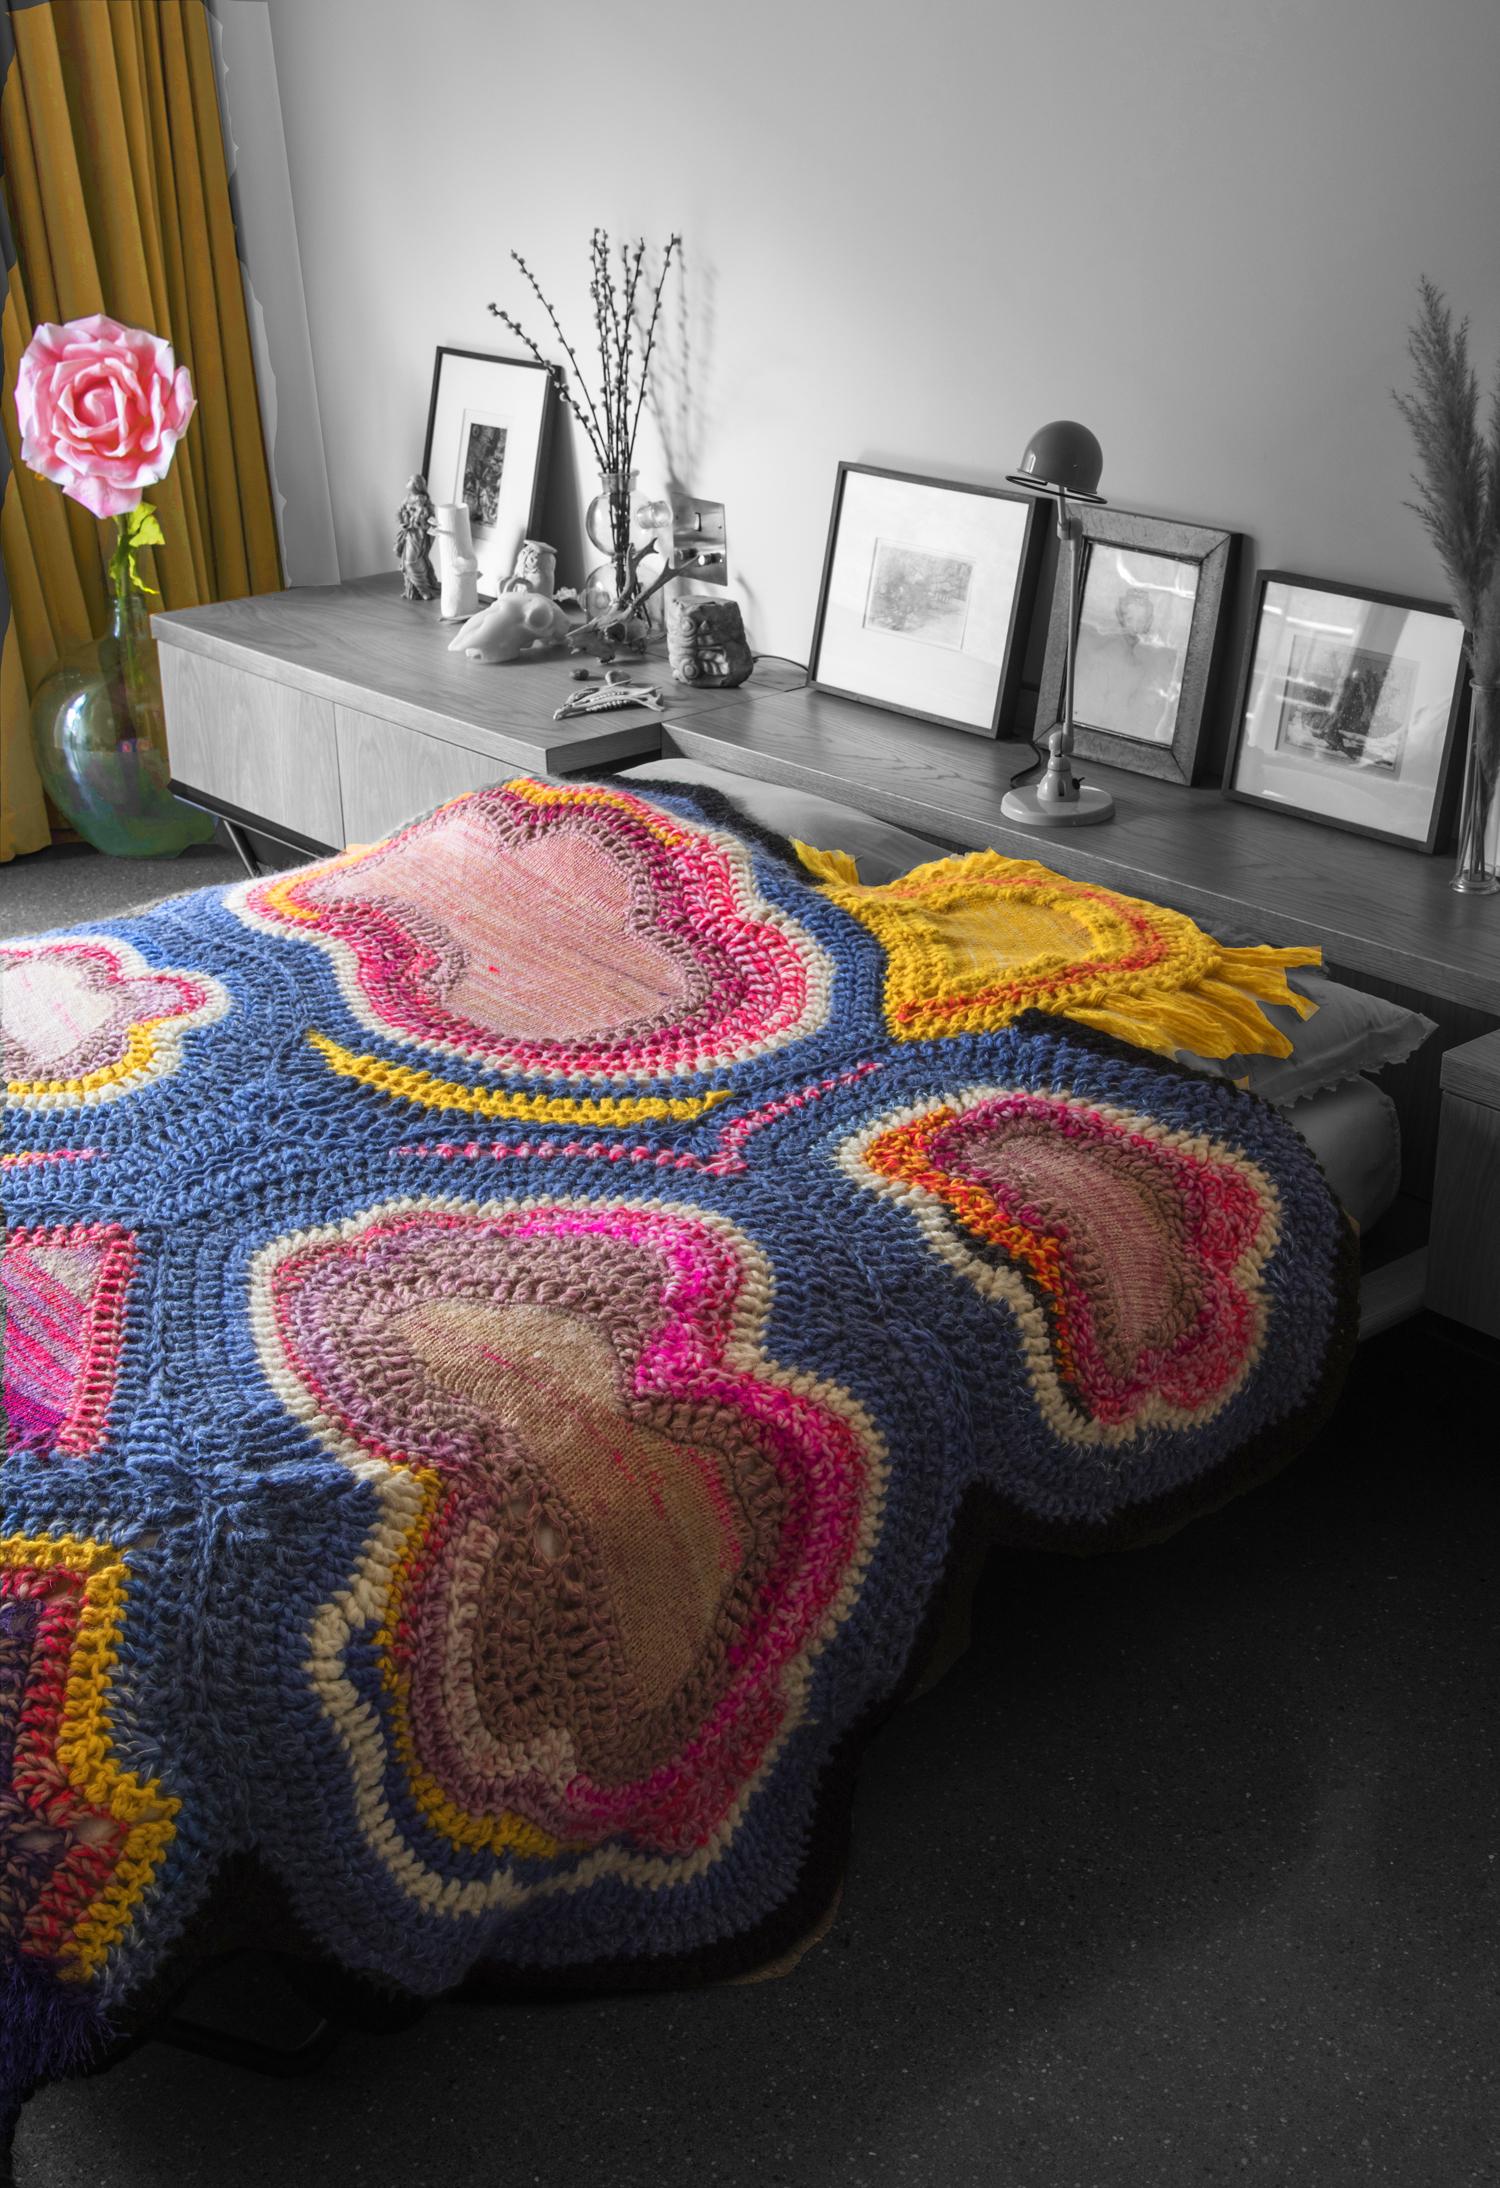 Sunrise 270 x 220 cm  Crochet and knit 2016